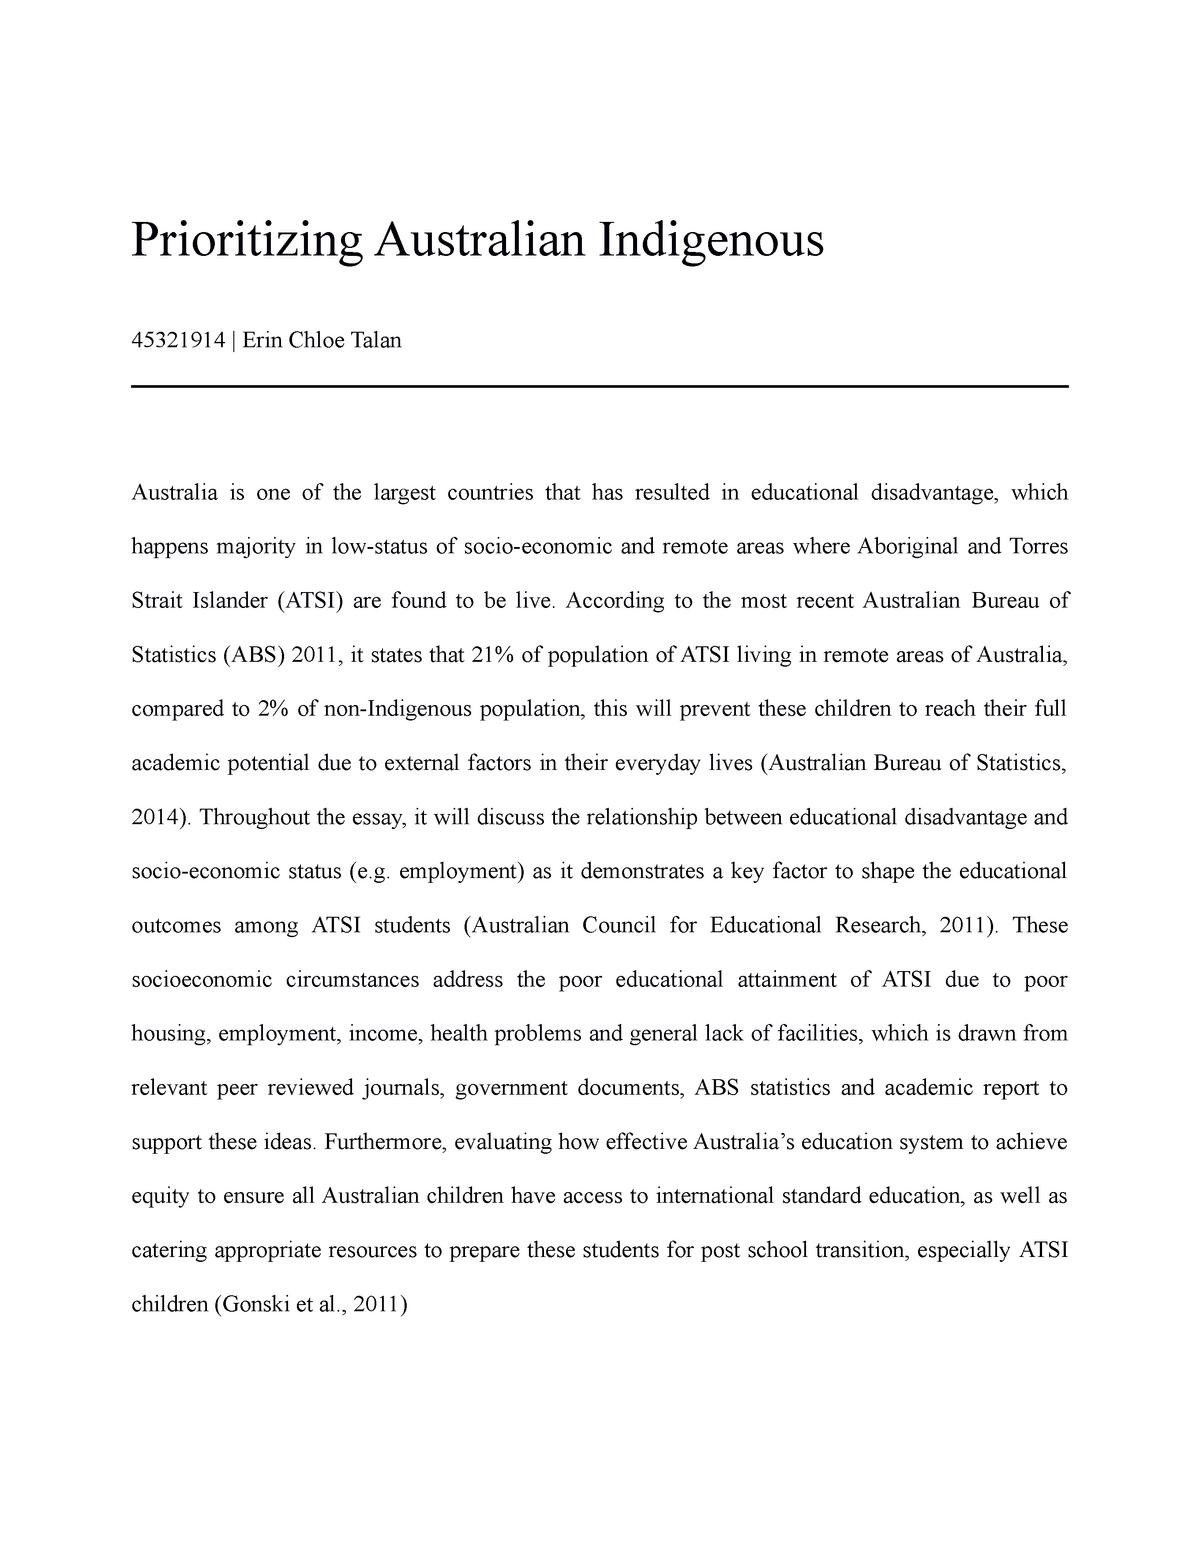 aboriginal and torres strait islander social disadvantage